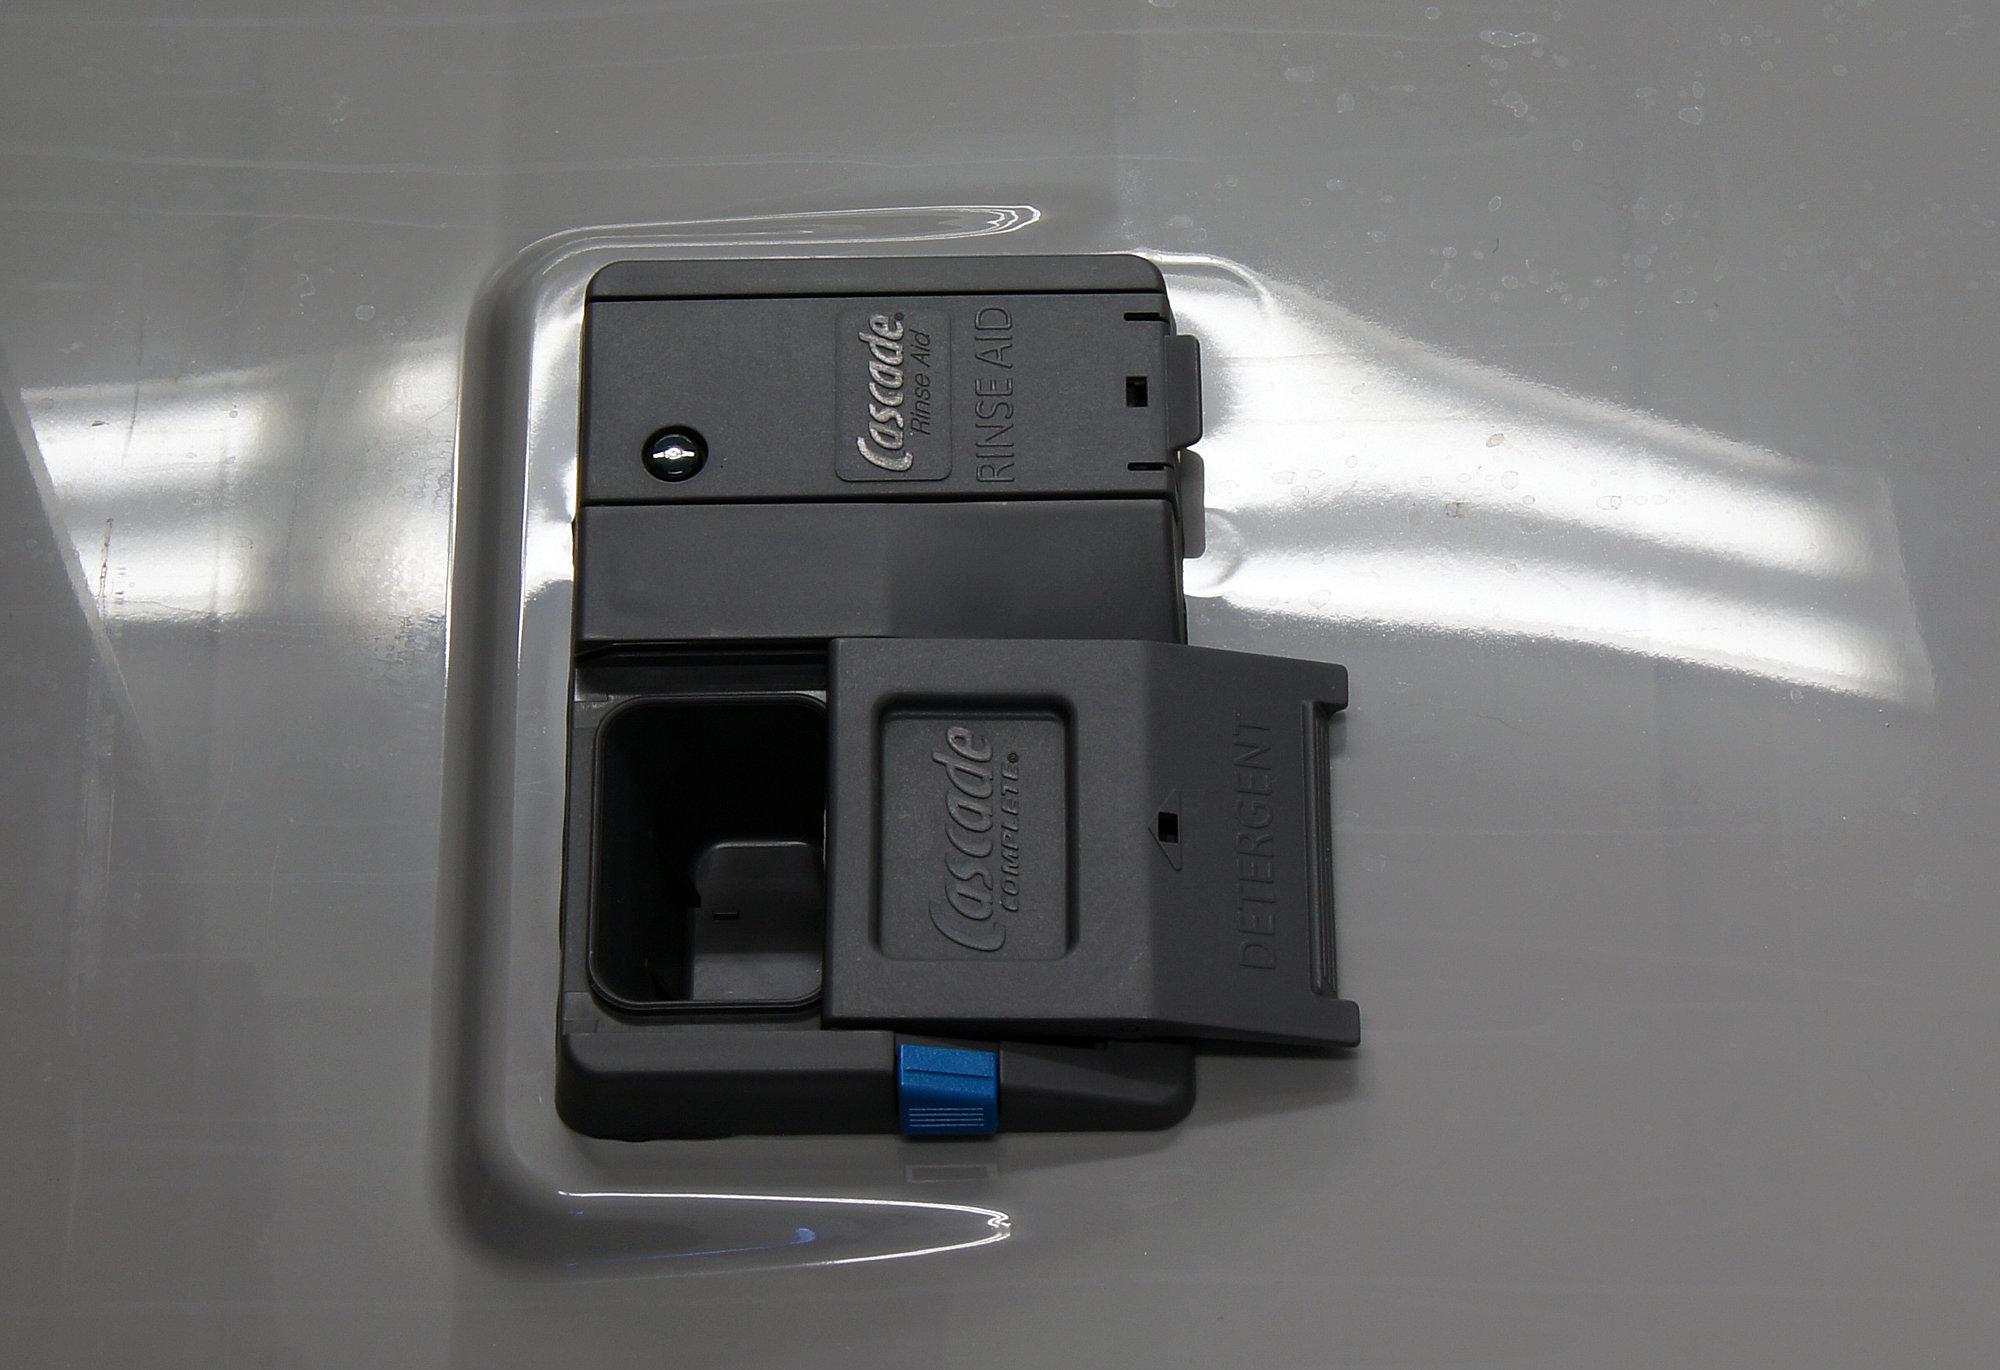 GE Artistry ADT521PGFWS detergent and rinse aid dispenser